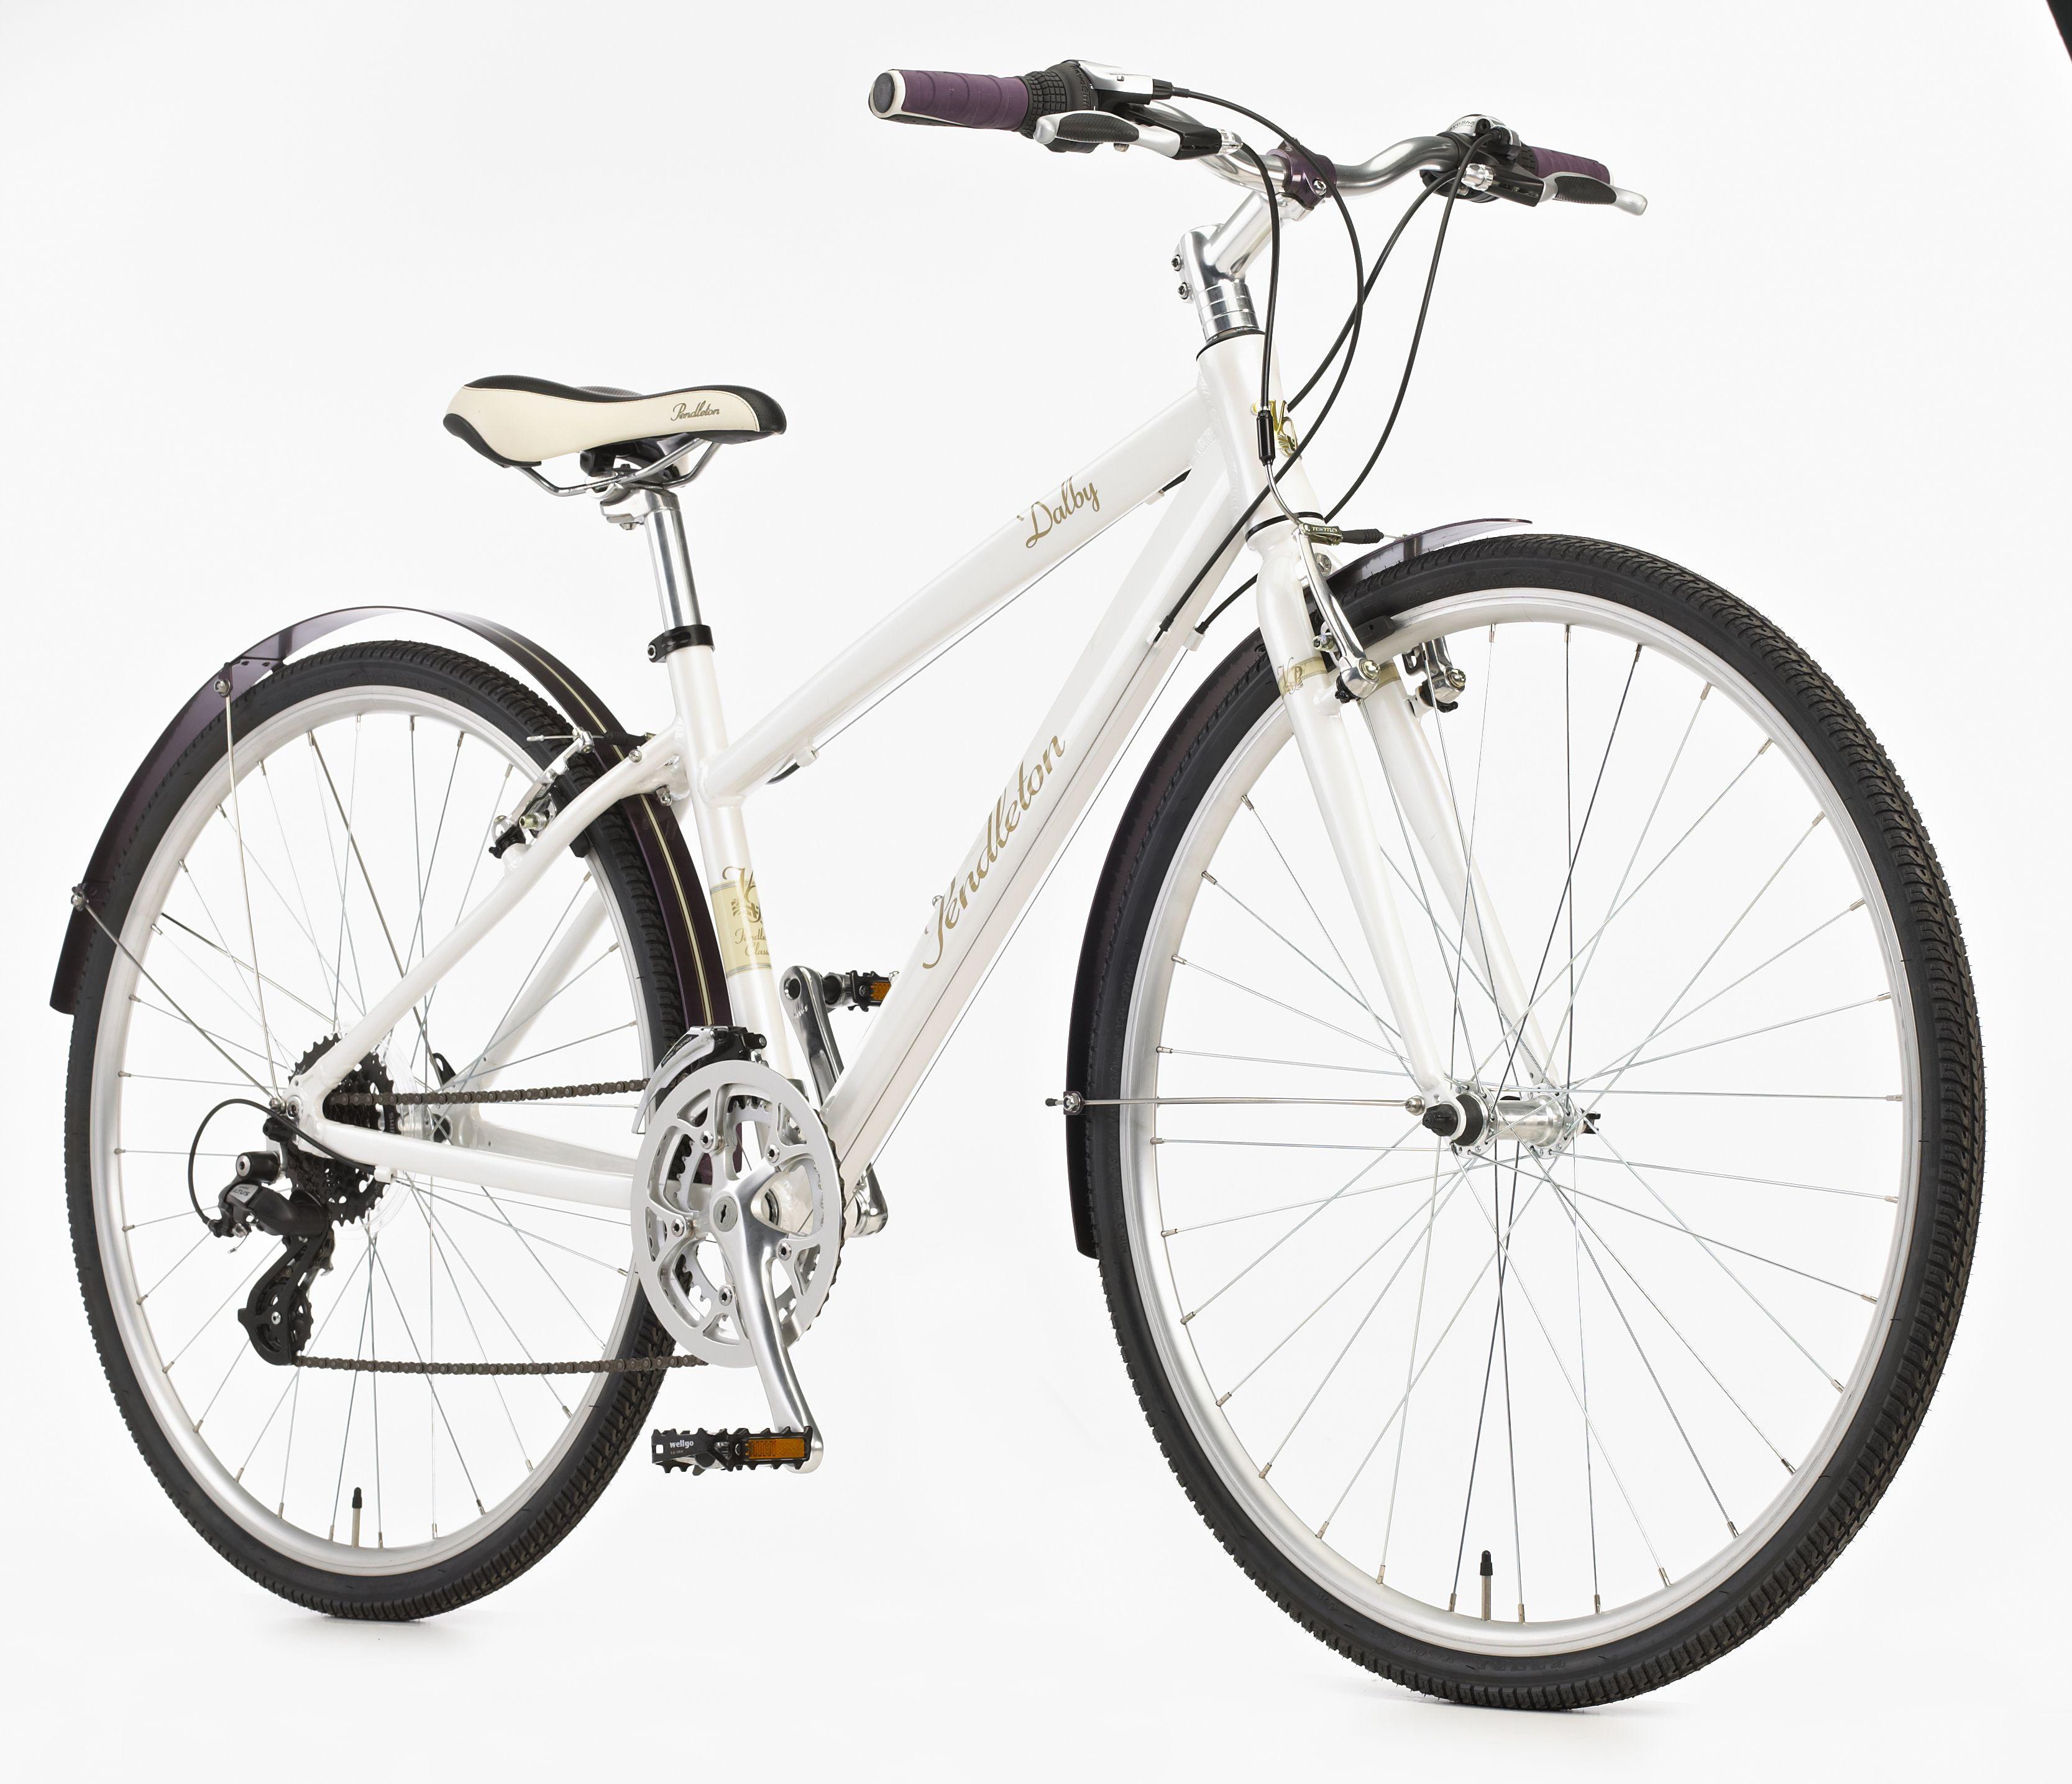 Dalby Pendleton Bike Range Ride Beautifully Exclusive To